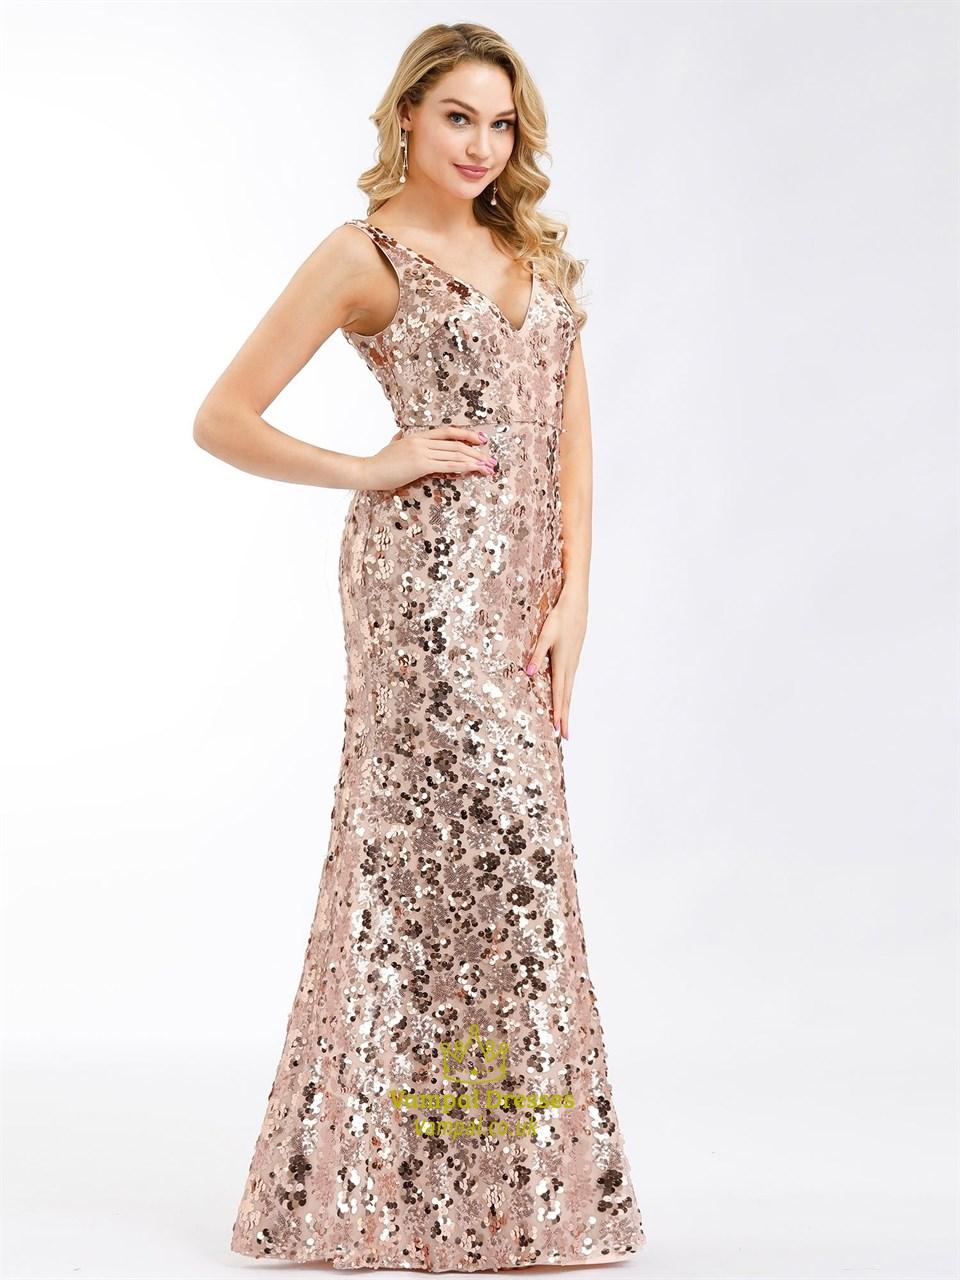 Striped Rose Gold Sequin V-neck Mermaid Long Prom Dress - VQ